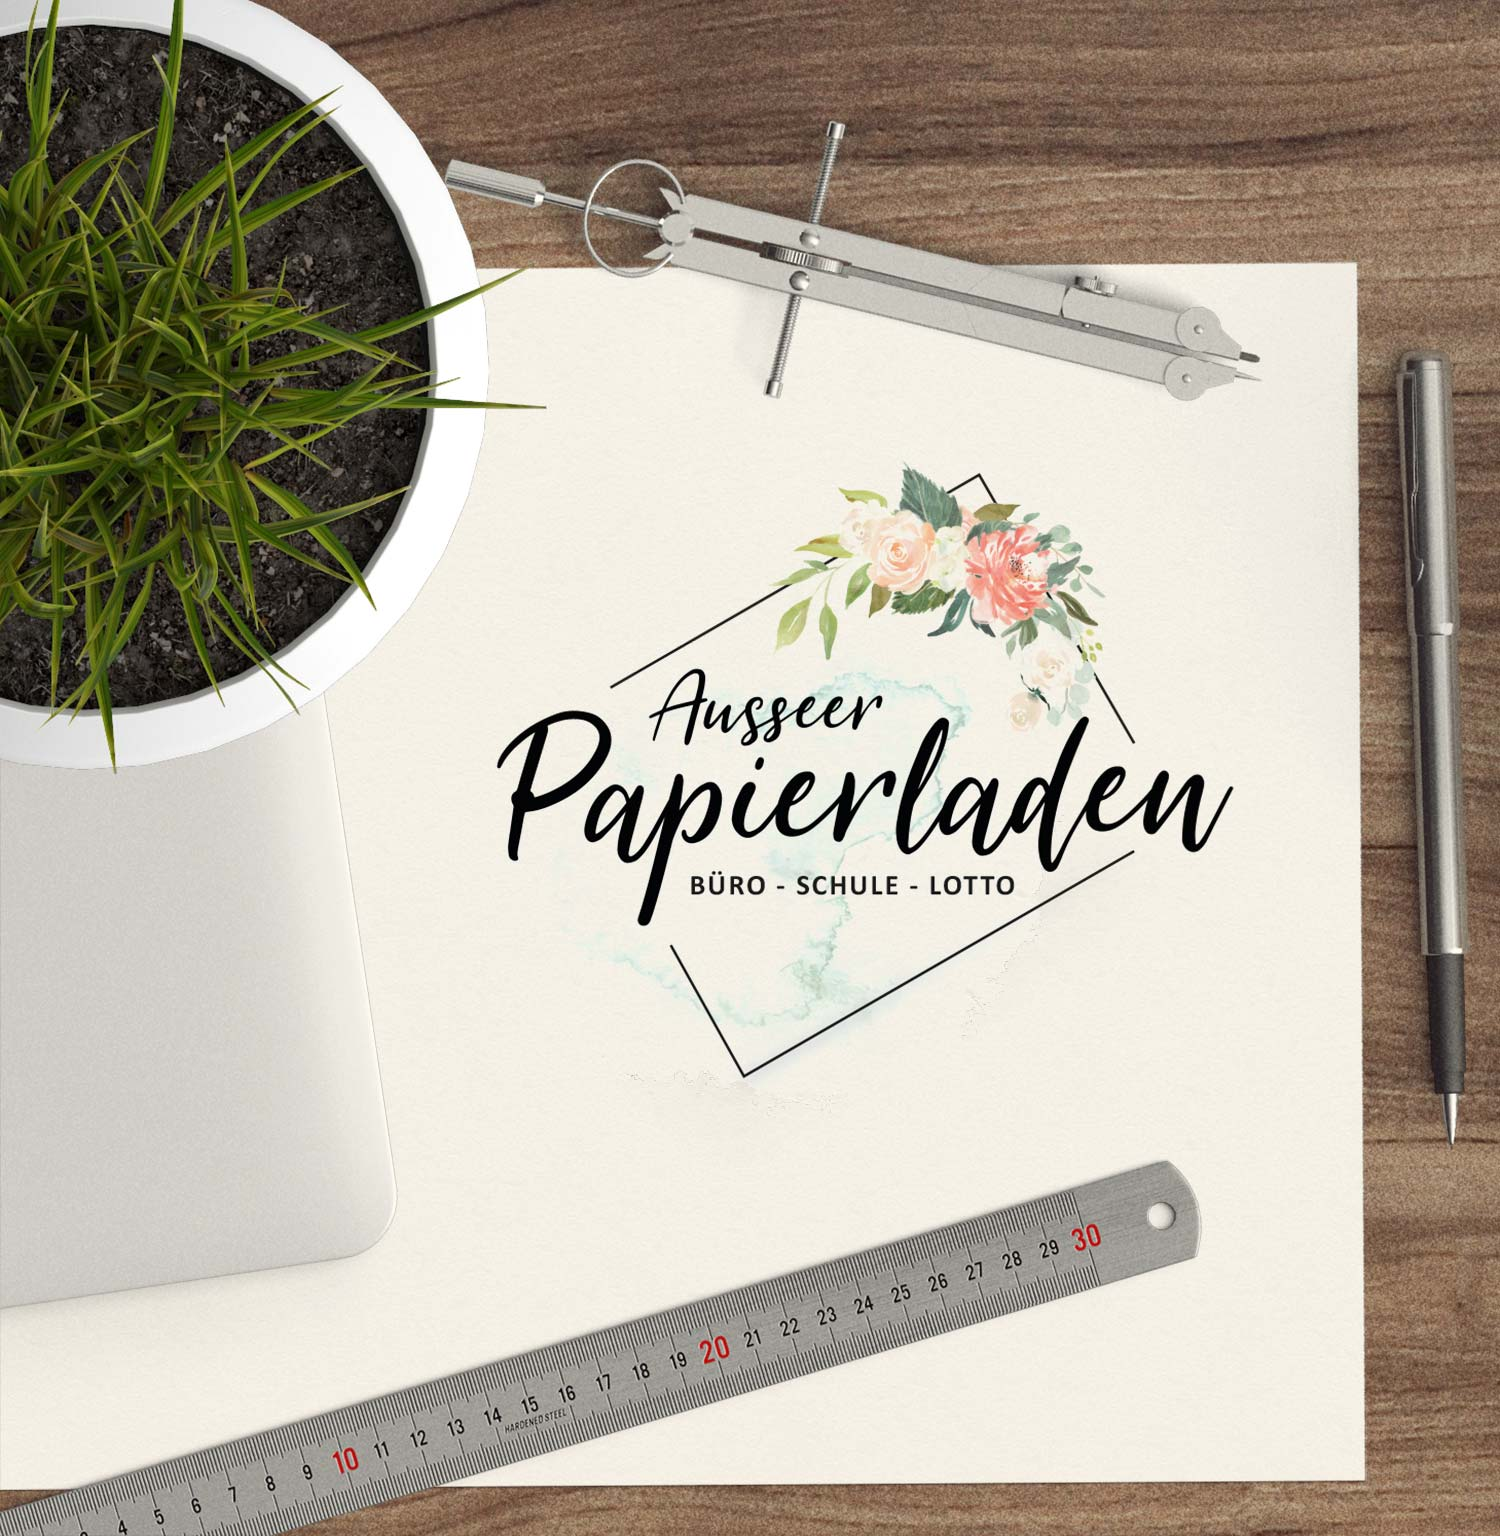 Ausseer Papierladen